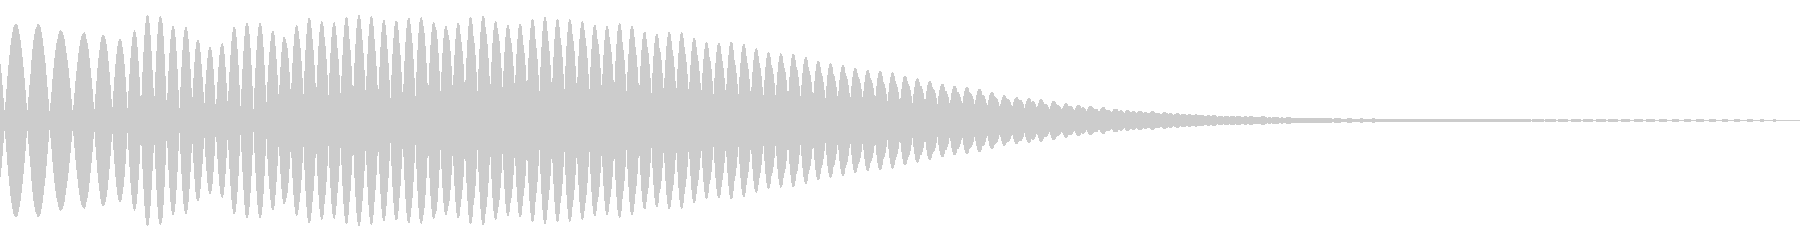 Ponu (a gentle sound without a round treogle)'s unreproduced waveform